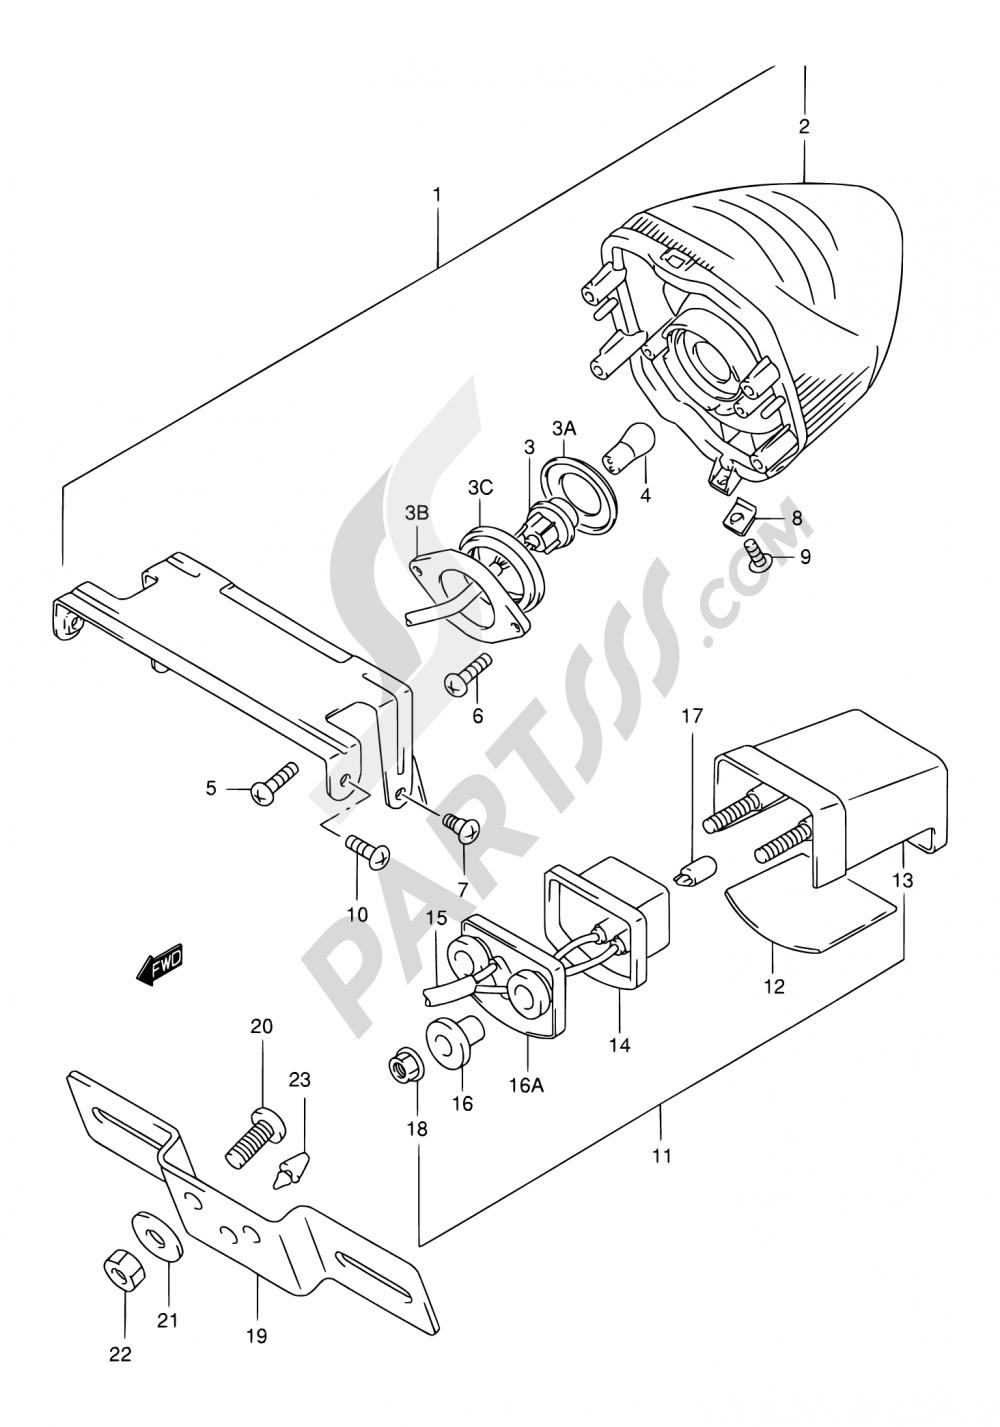 28 - TAIL LAMP (MODEL W/X/Y/K1/K2) Suzuki GSX750F 2002